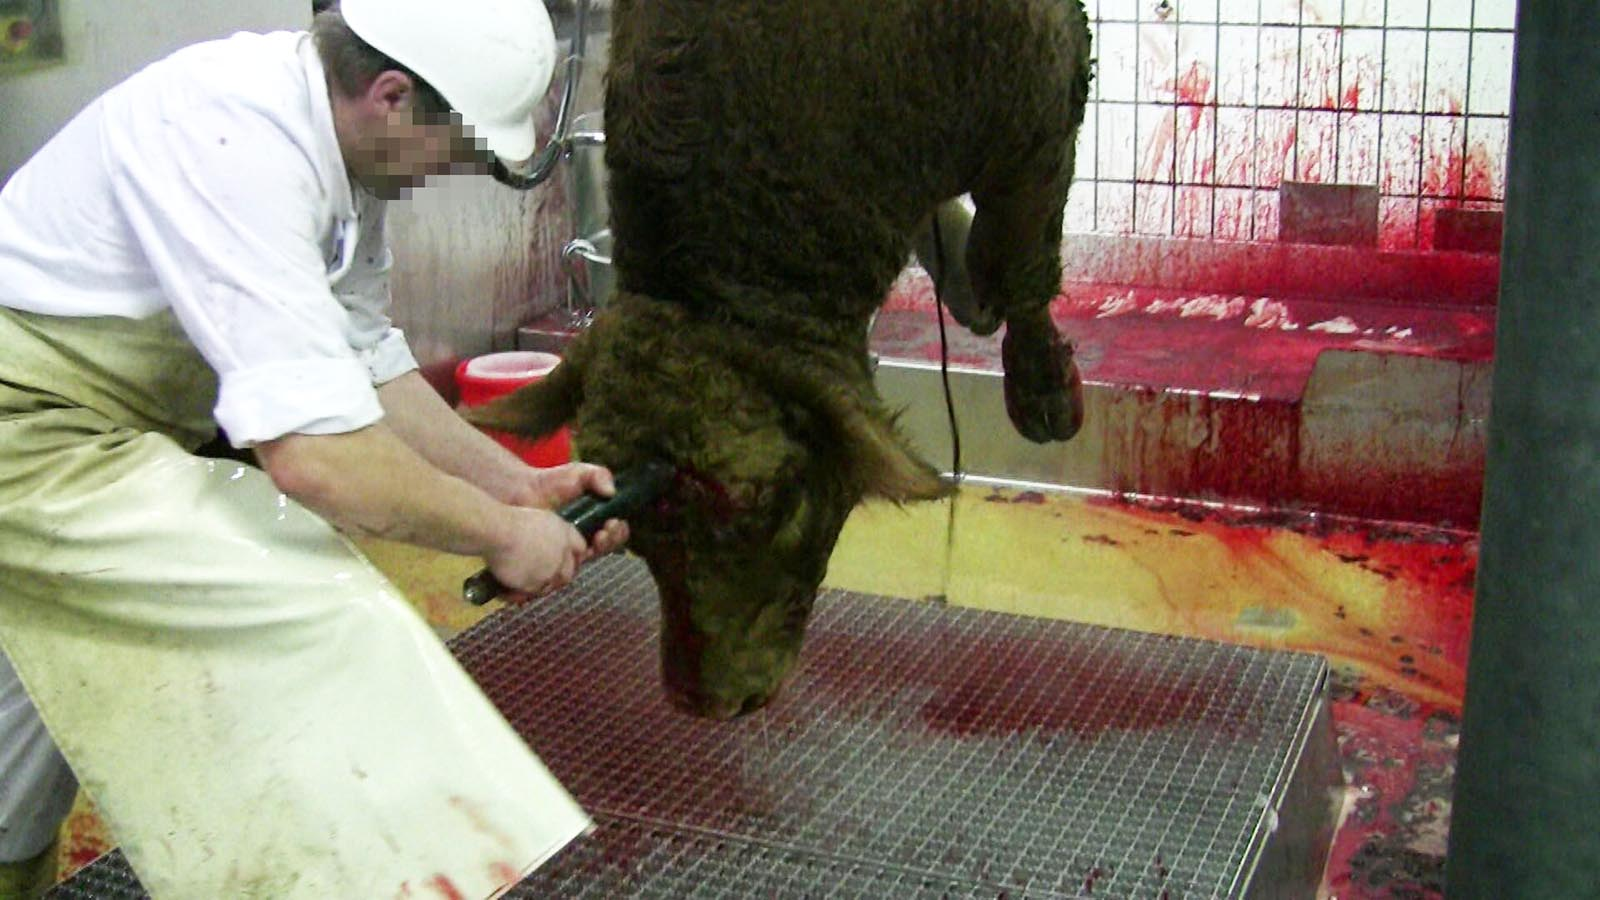 Schlachtung schwangerer Kühe: Kälber ersticken im Mutterleib